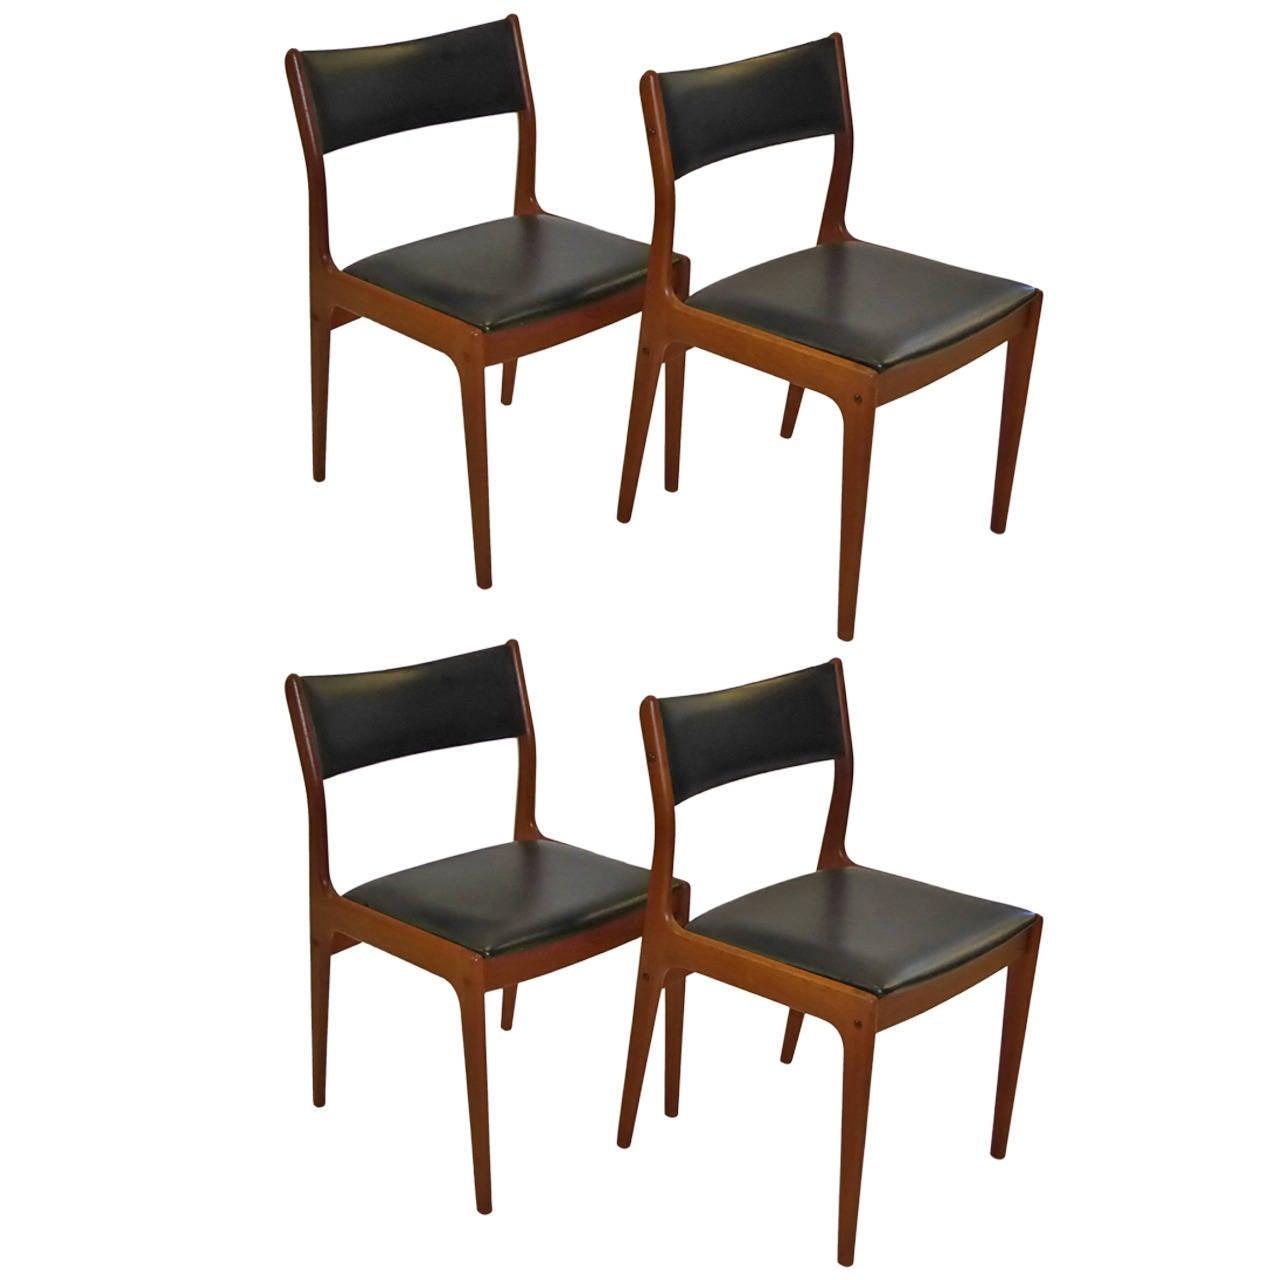 Johannes Andersen For Uldum Mobelfabrik Danish Teak Dining Chairs For Sale At